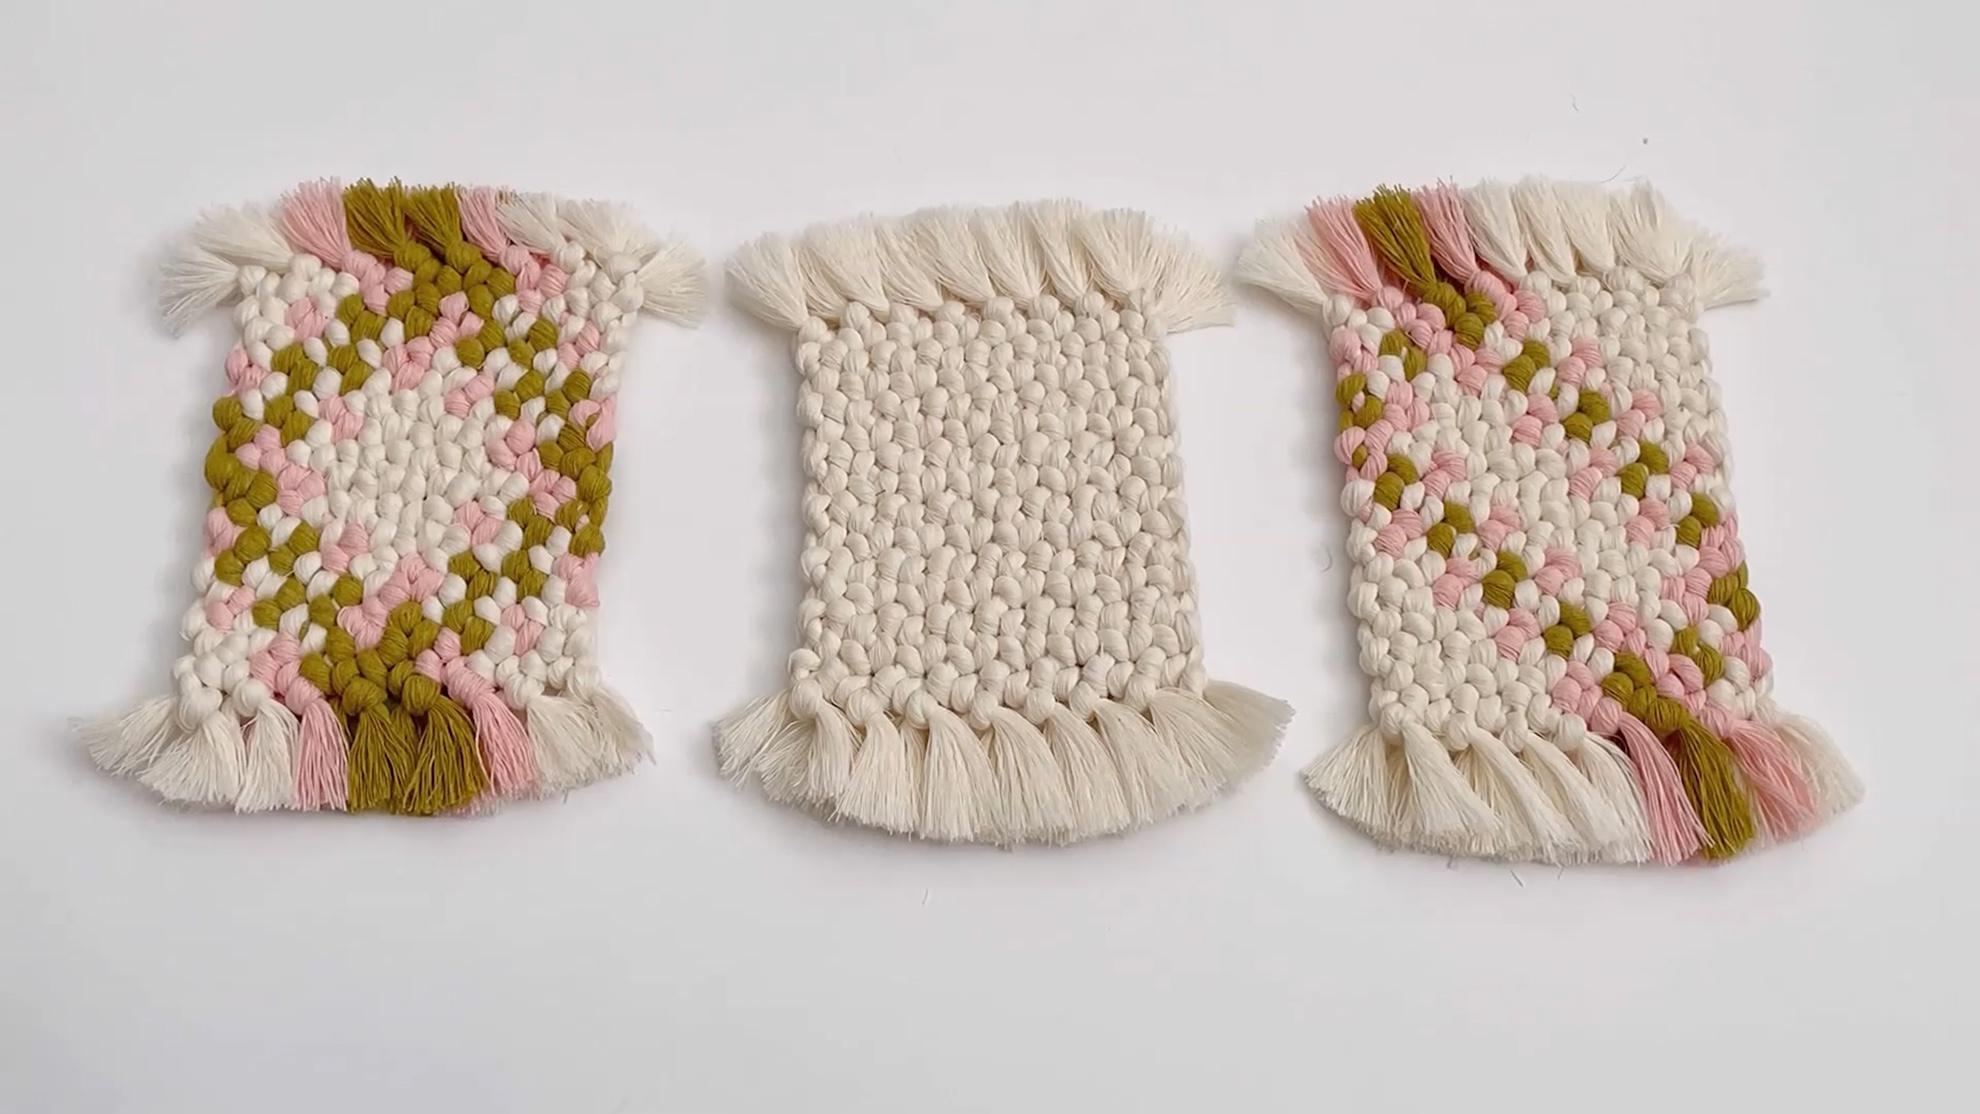 DIY Macrame视频教程:编织杯垫